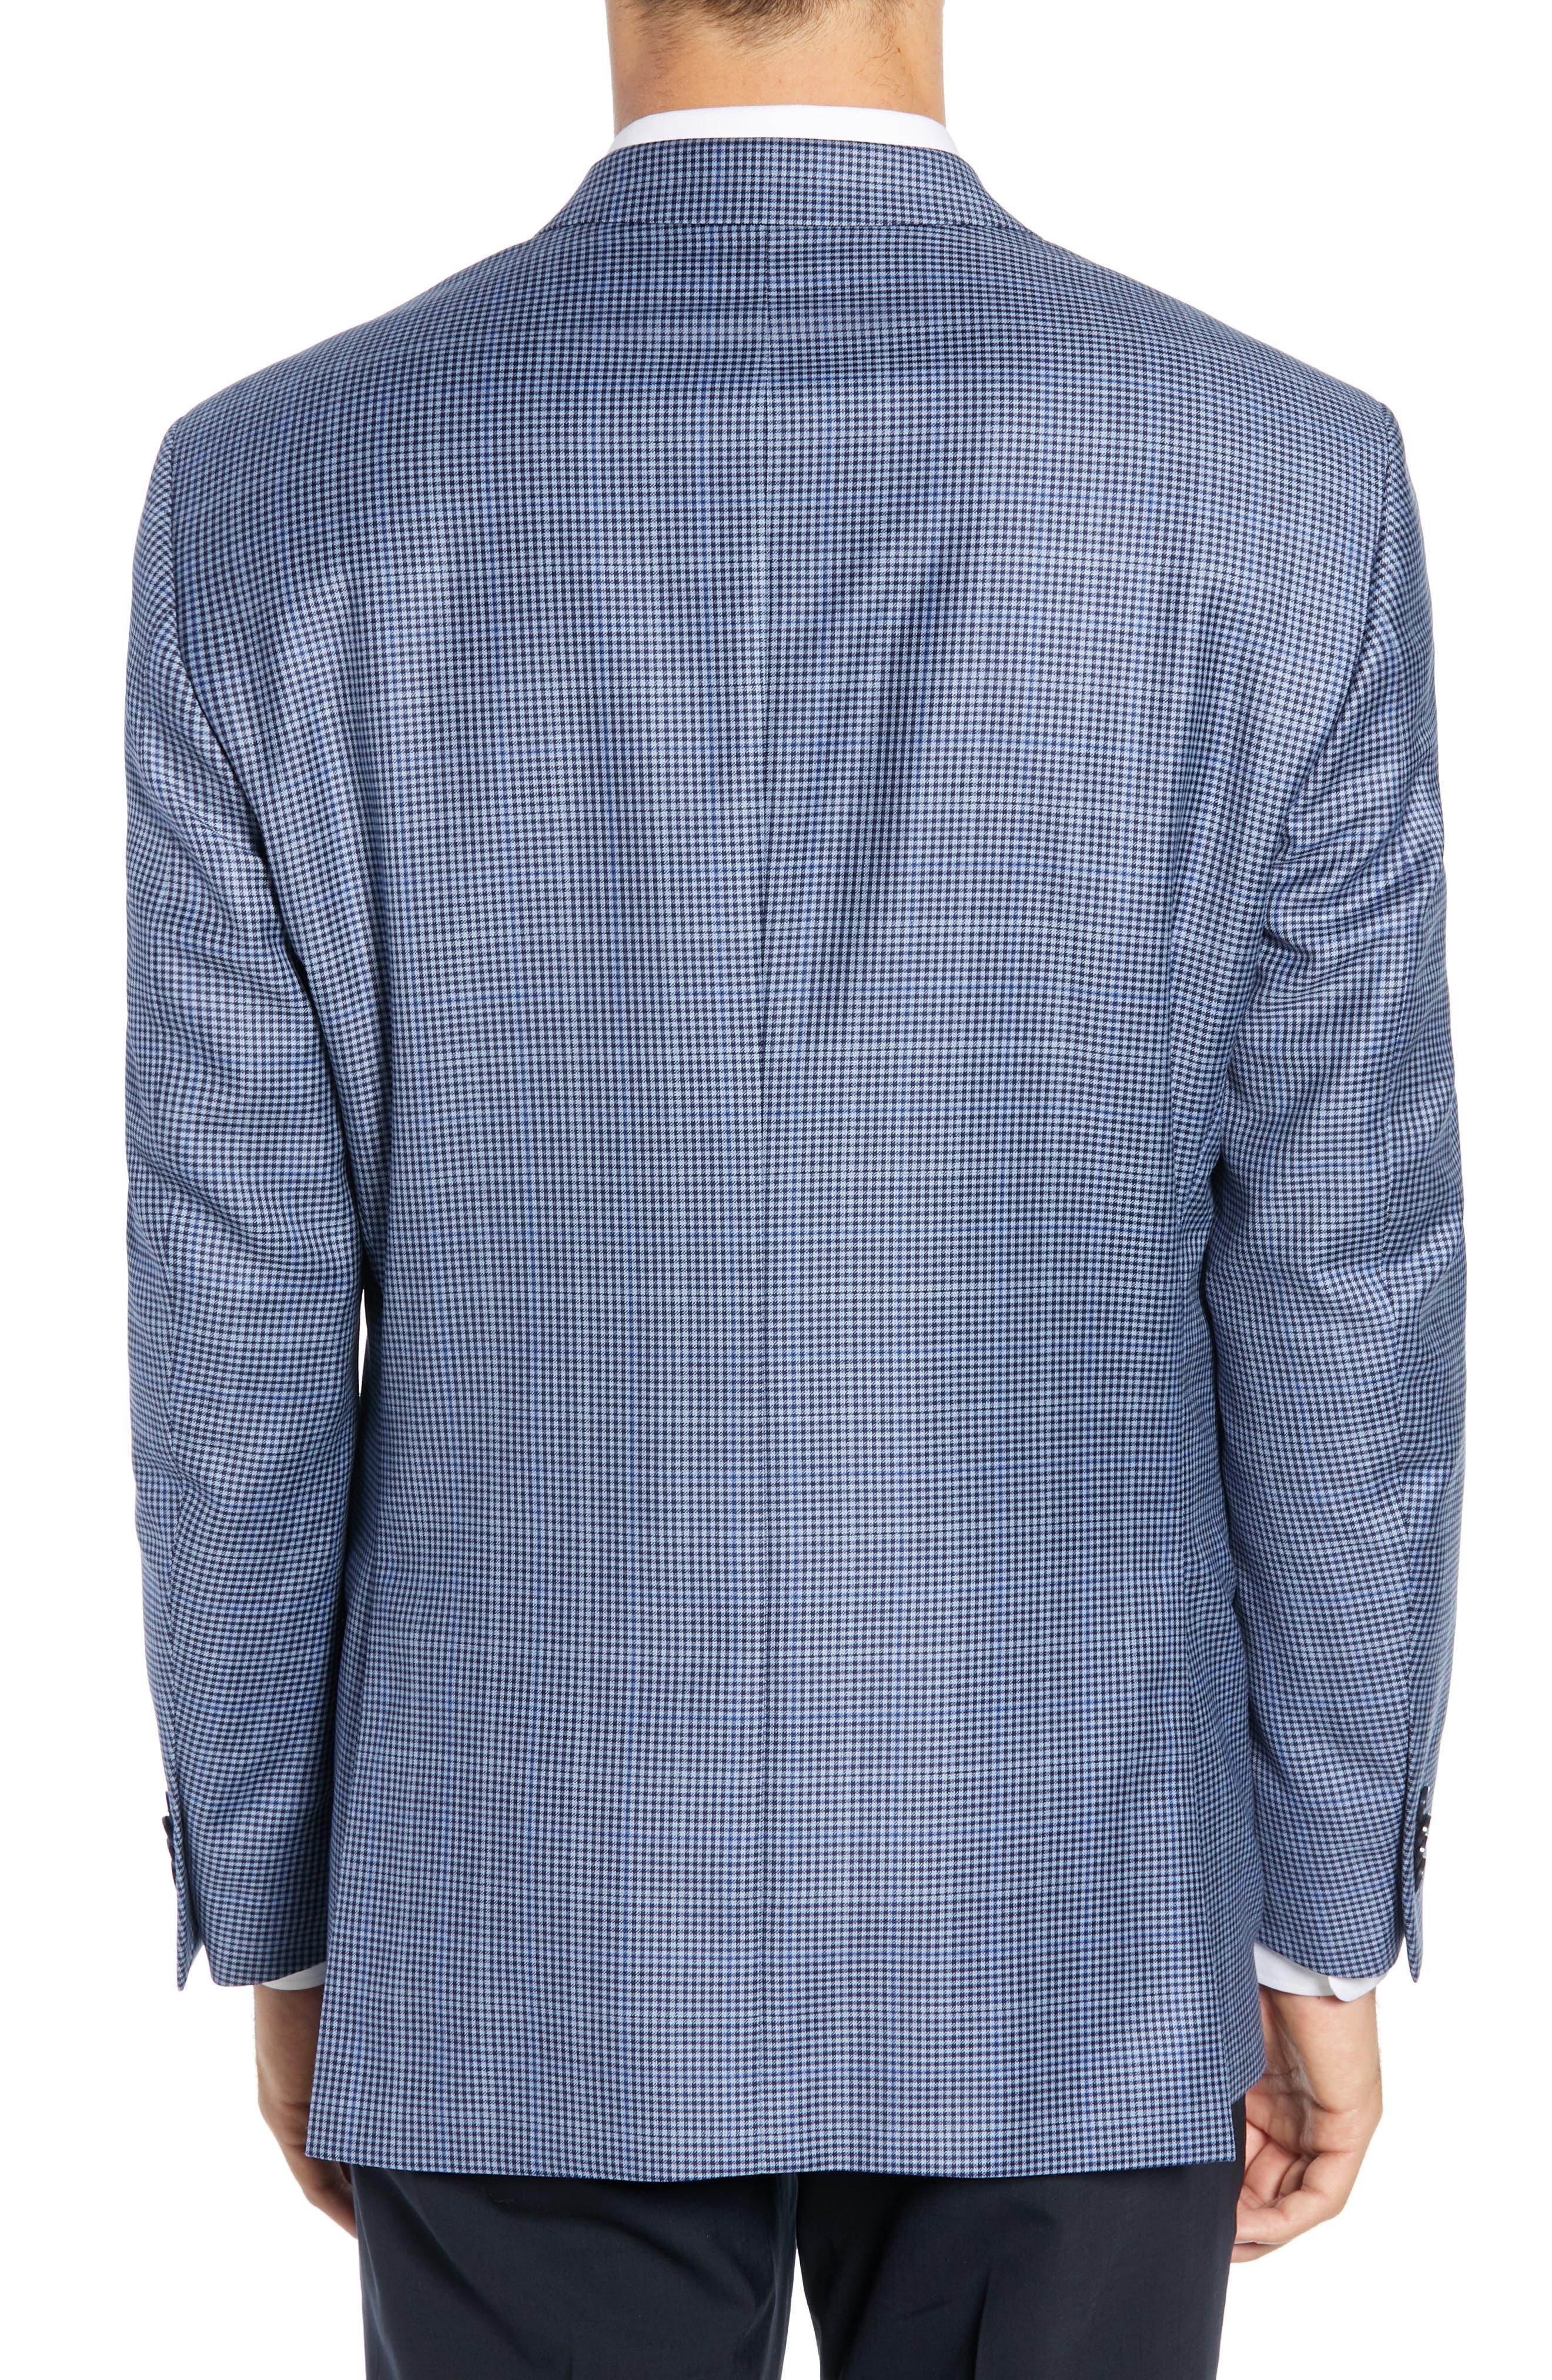 PETER MILLAR,                             Classic Fit Houndstooth Sport Coat,                             Alternate thumbnail 2, color,                             LIGHT BLUE